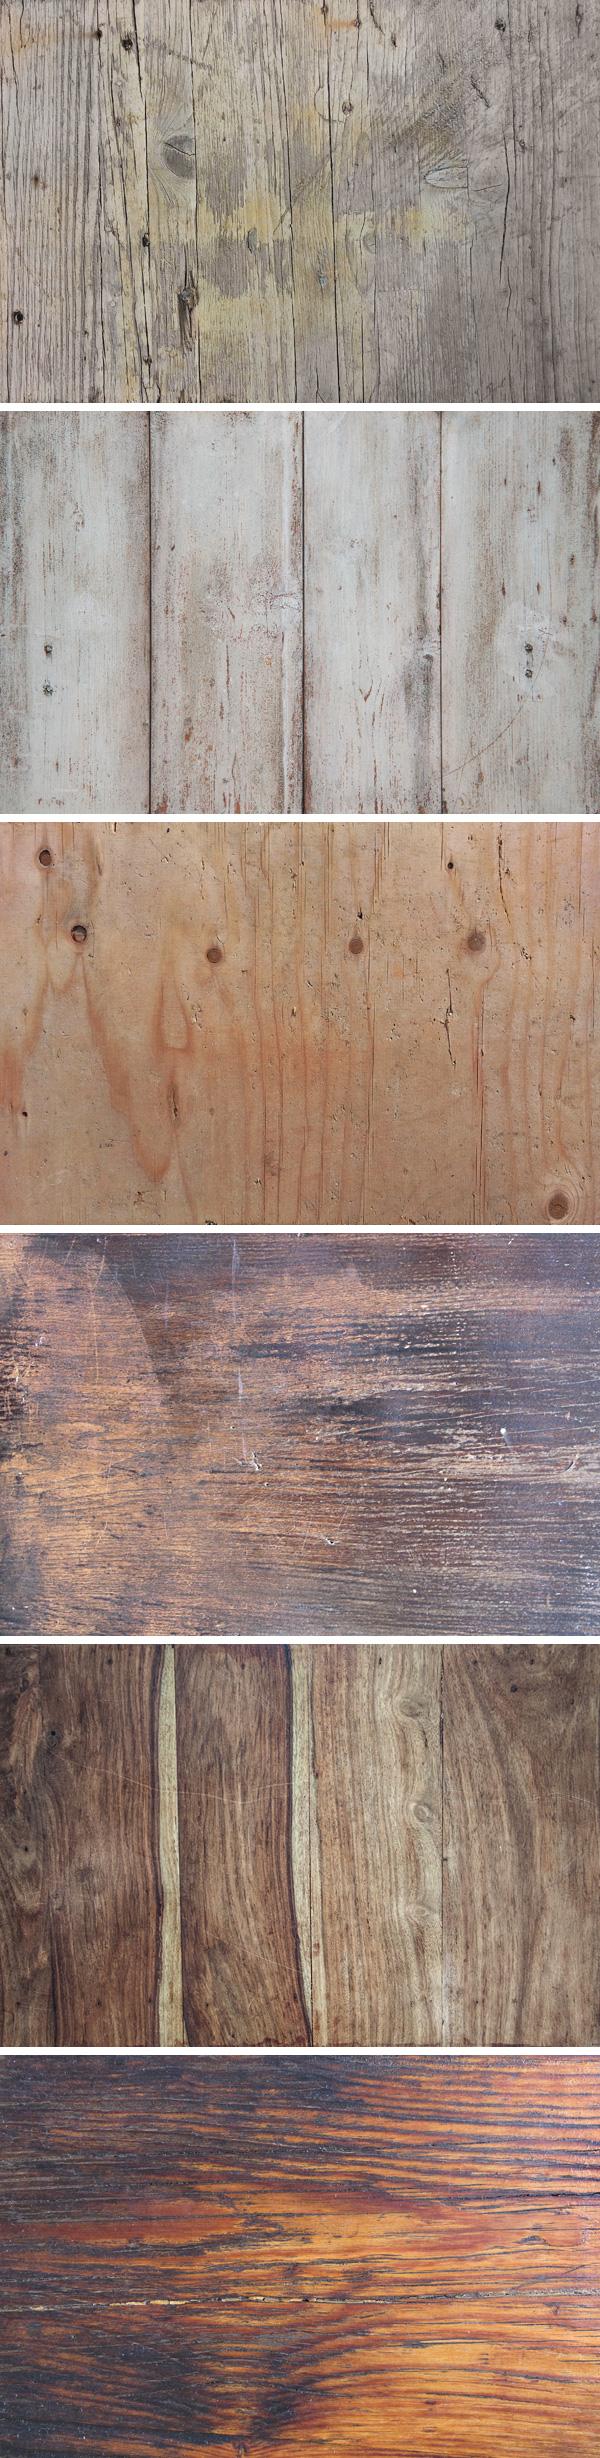 6-Vintage-Wood-Textures